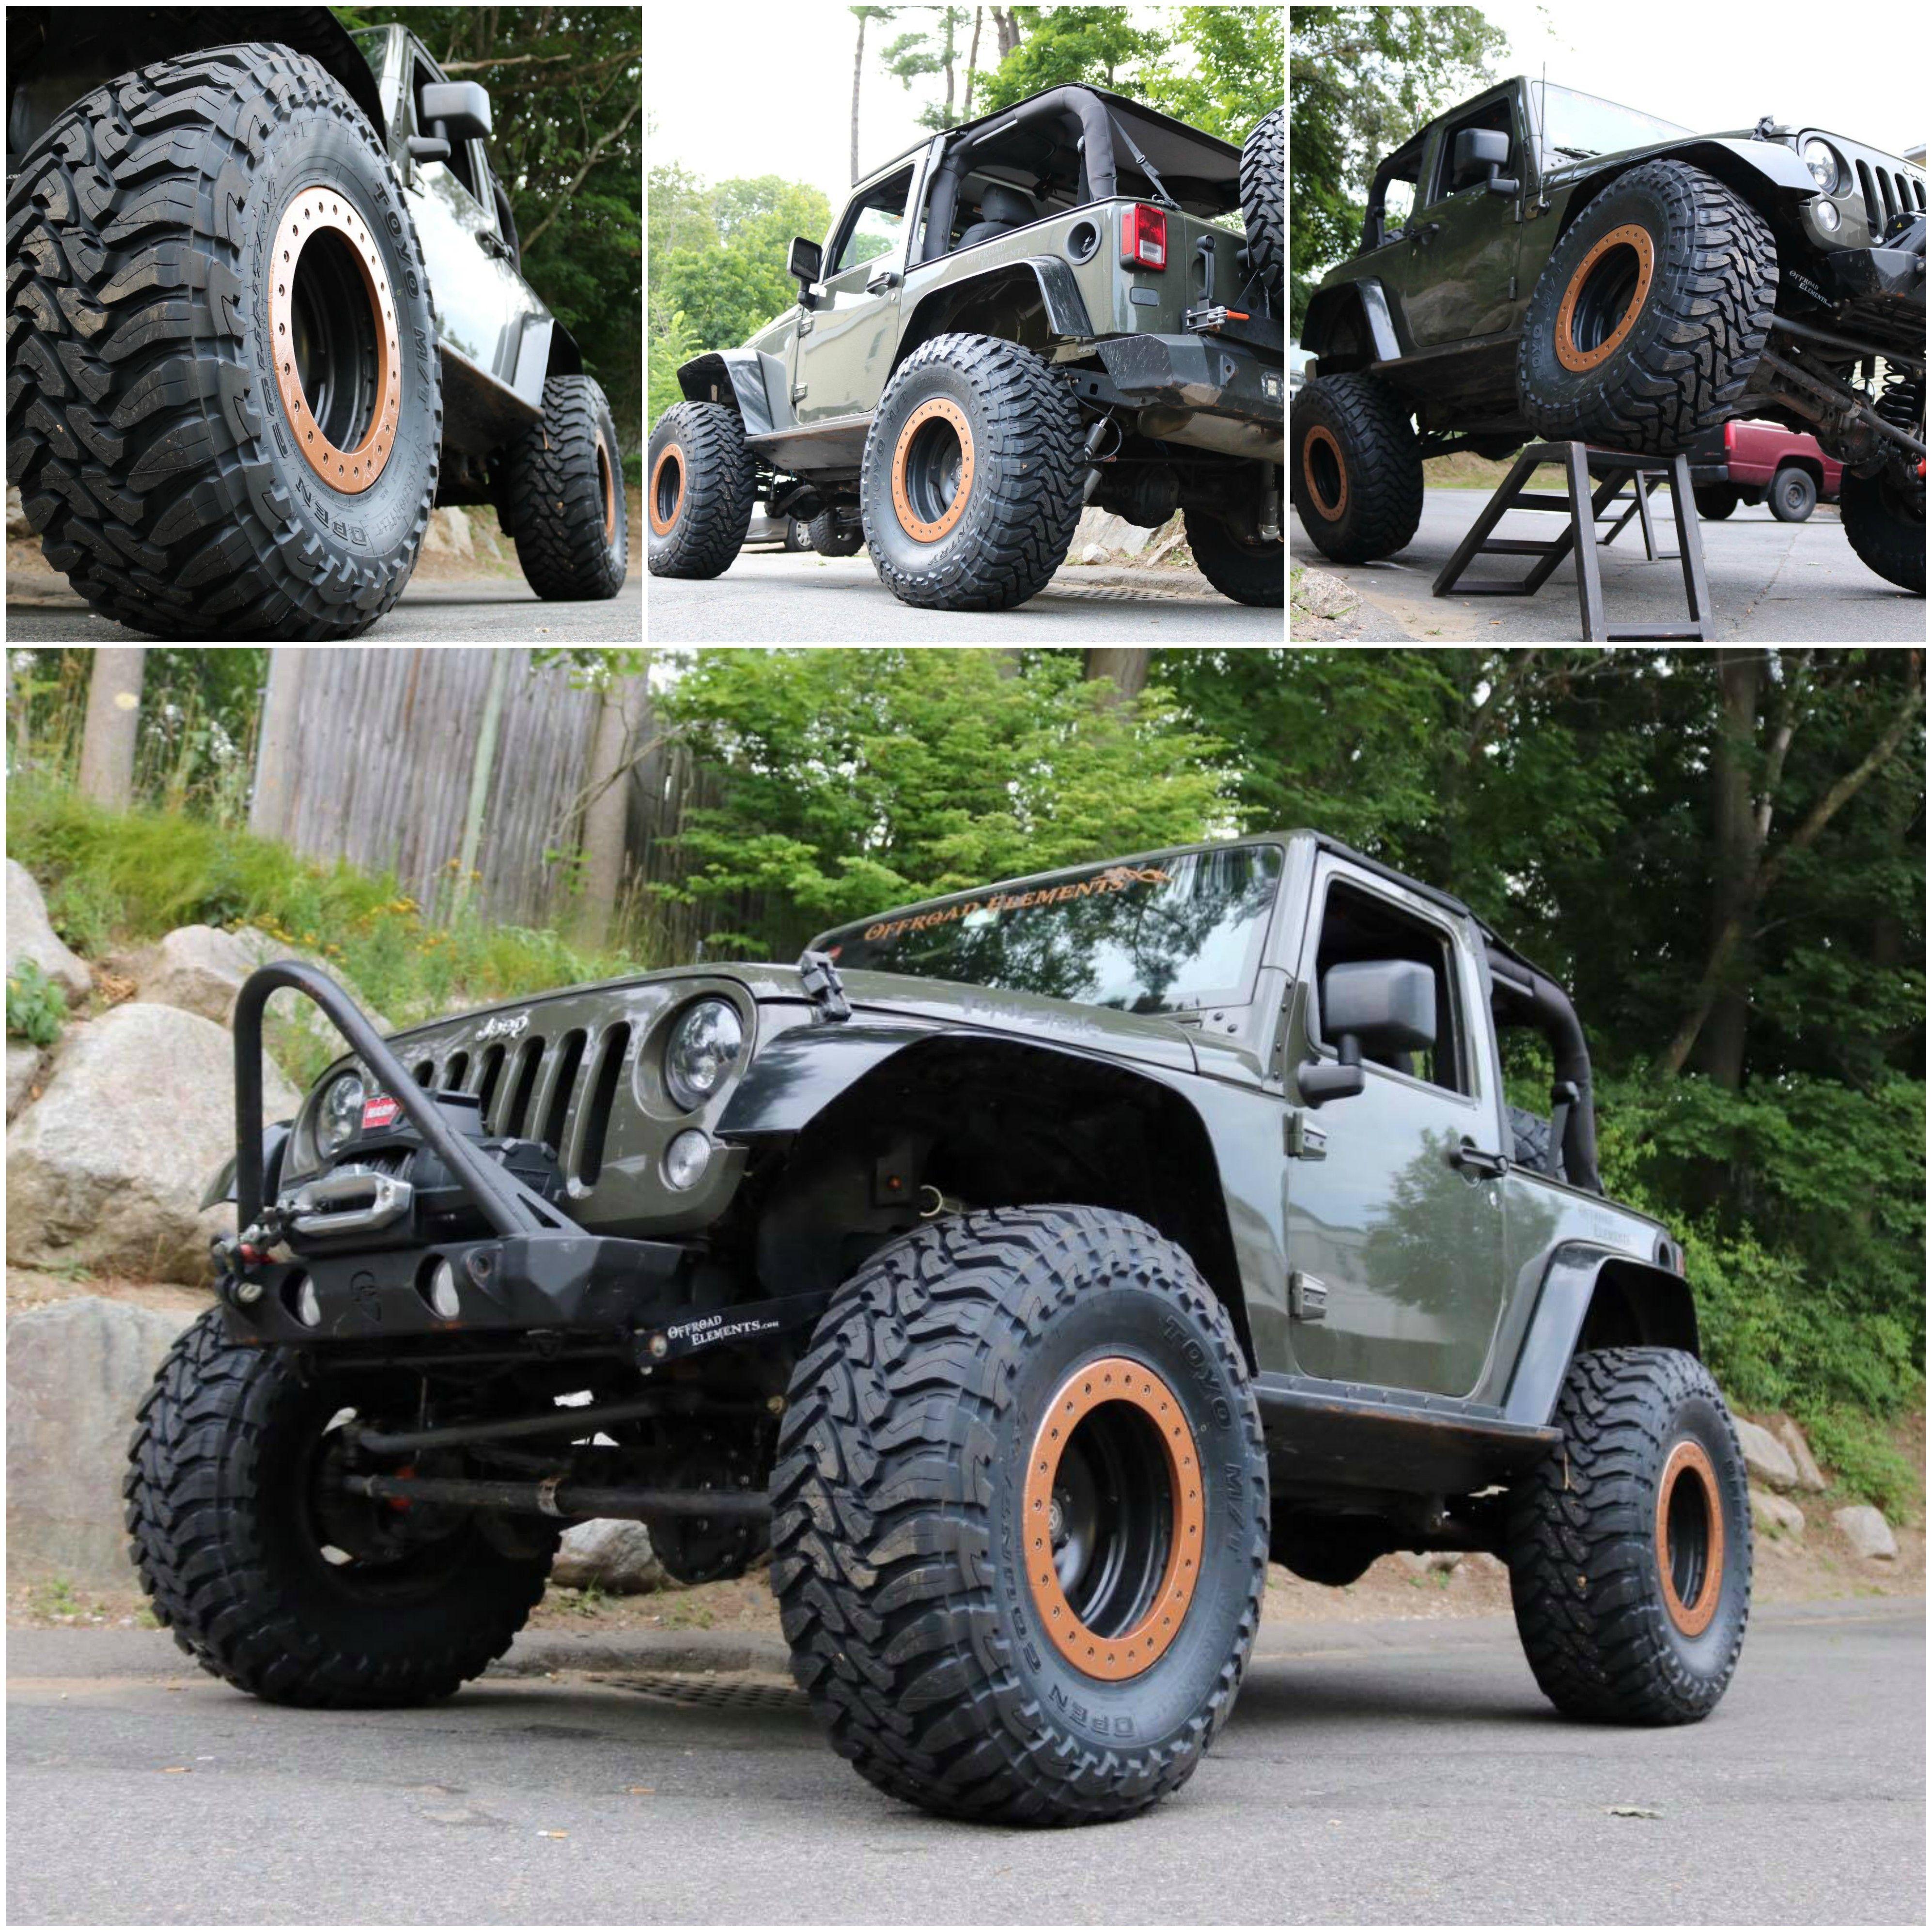 2015 Jeep Wrangler Jk Tombstone Rock Krawler 3 5 Max Travel Suspension System Jcr Offroad Front Bumper Lod Of 2015 Jeep Wrangler Jeep Wrangler Jk Jeep